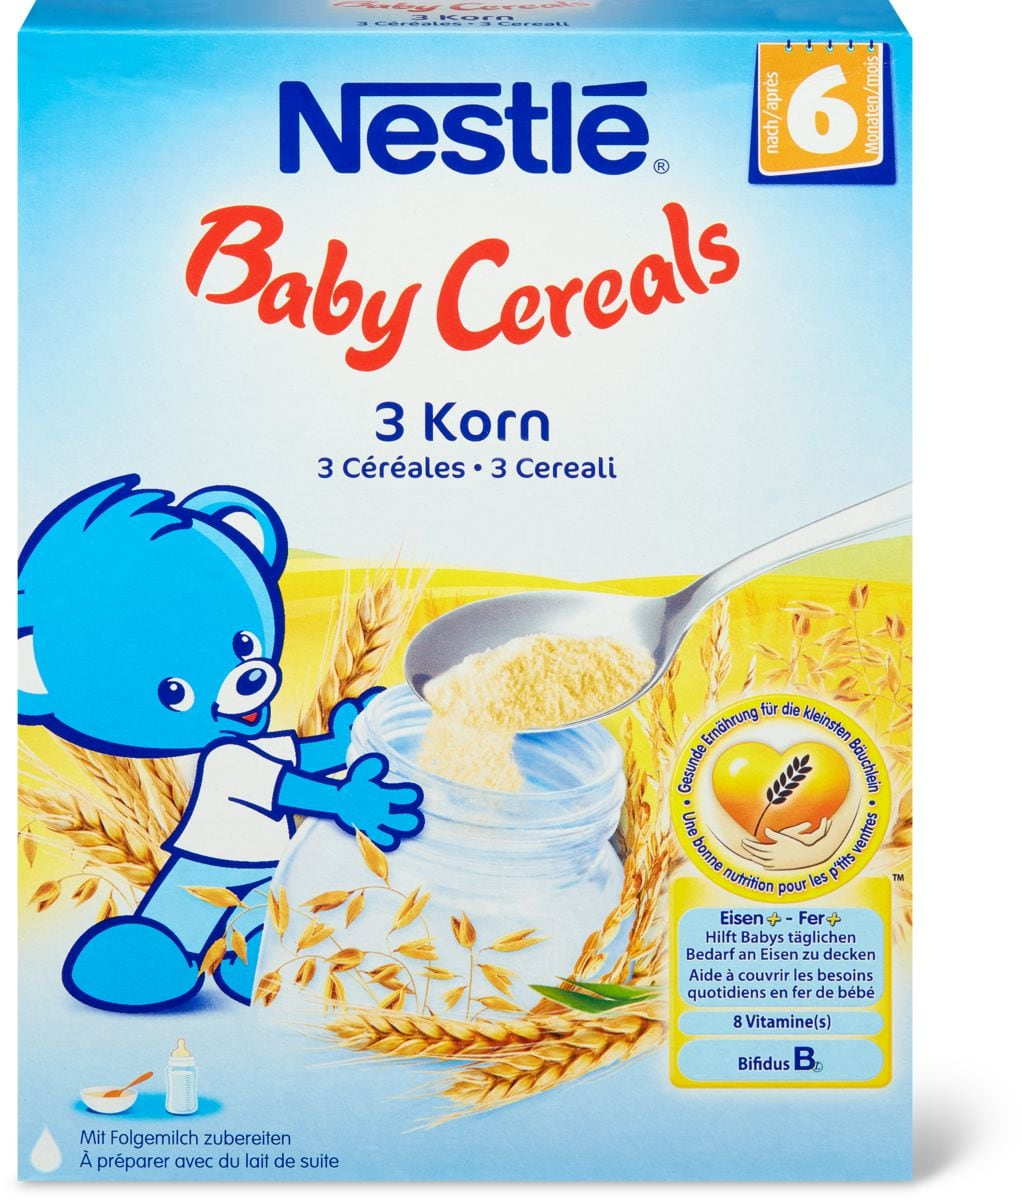 Nestlé Baby Cereals 3 Korn